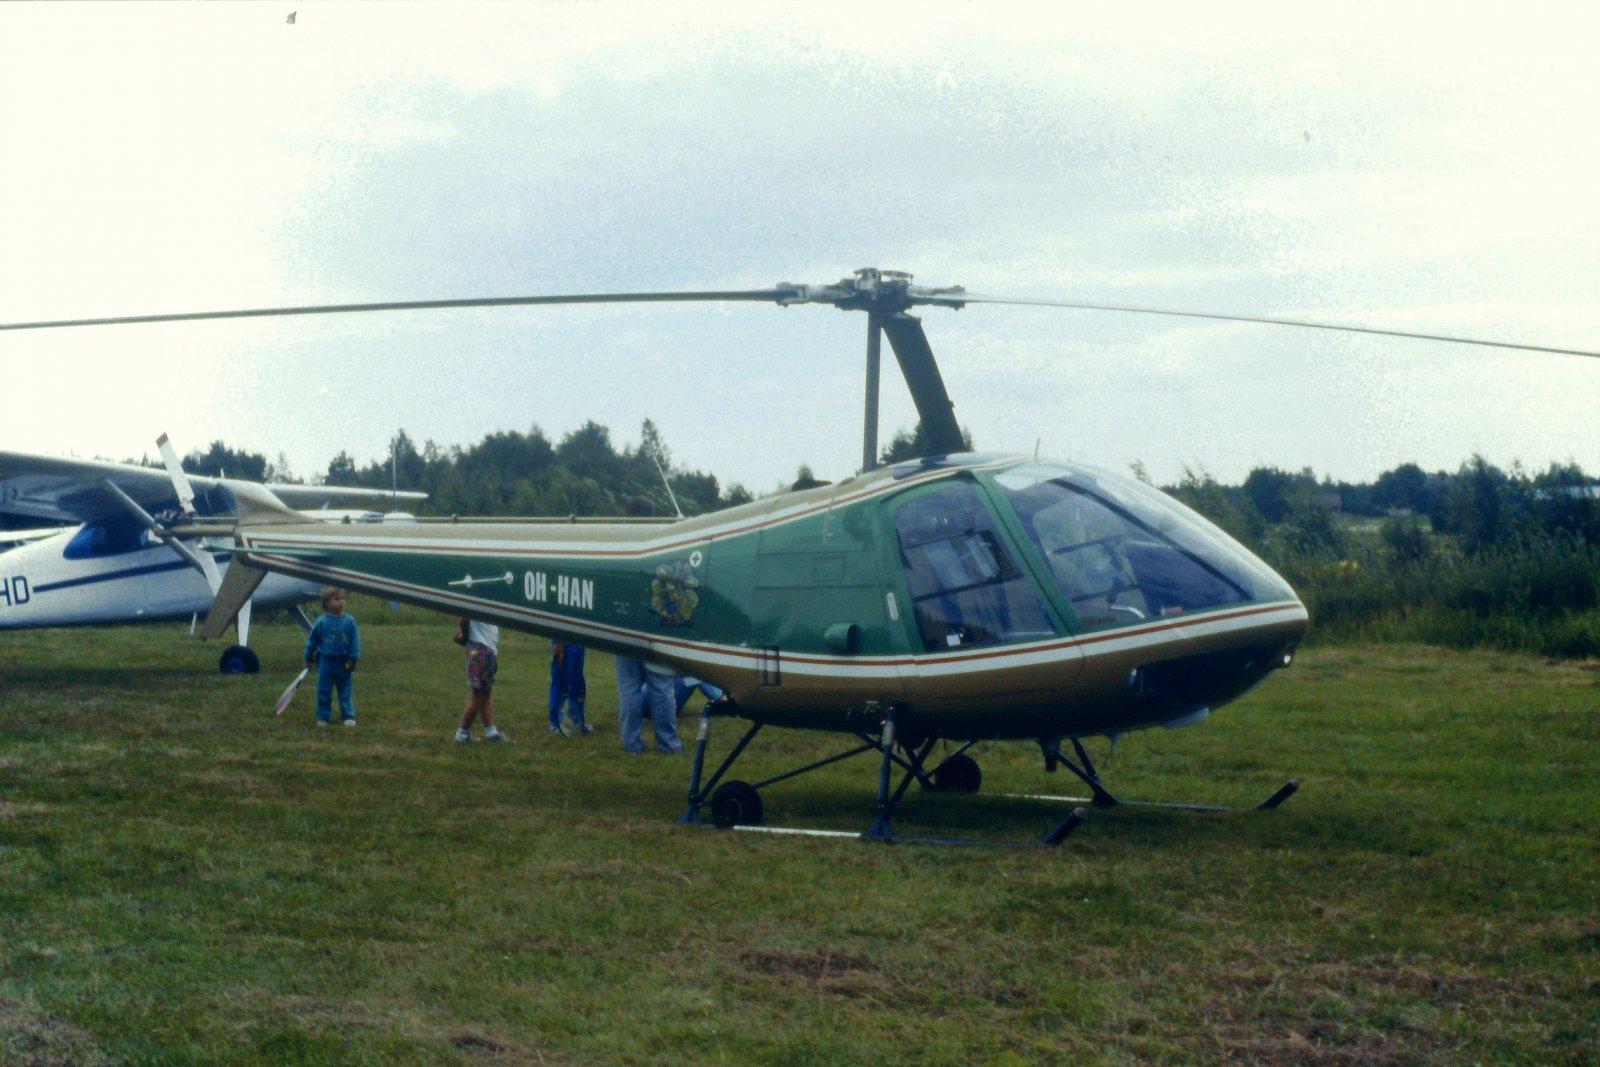 Enstrom 280C Shark OH-HAN EFHN 1989